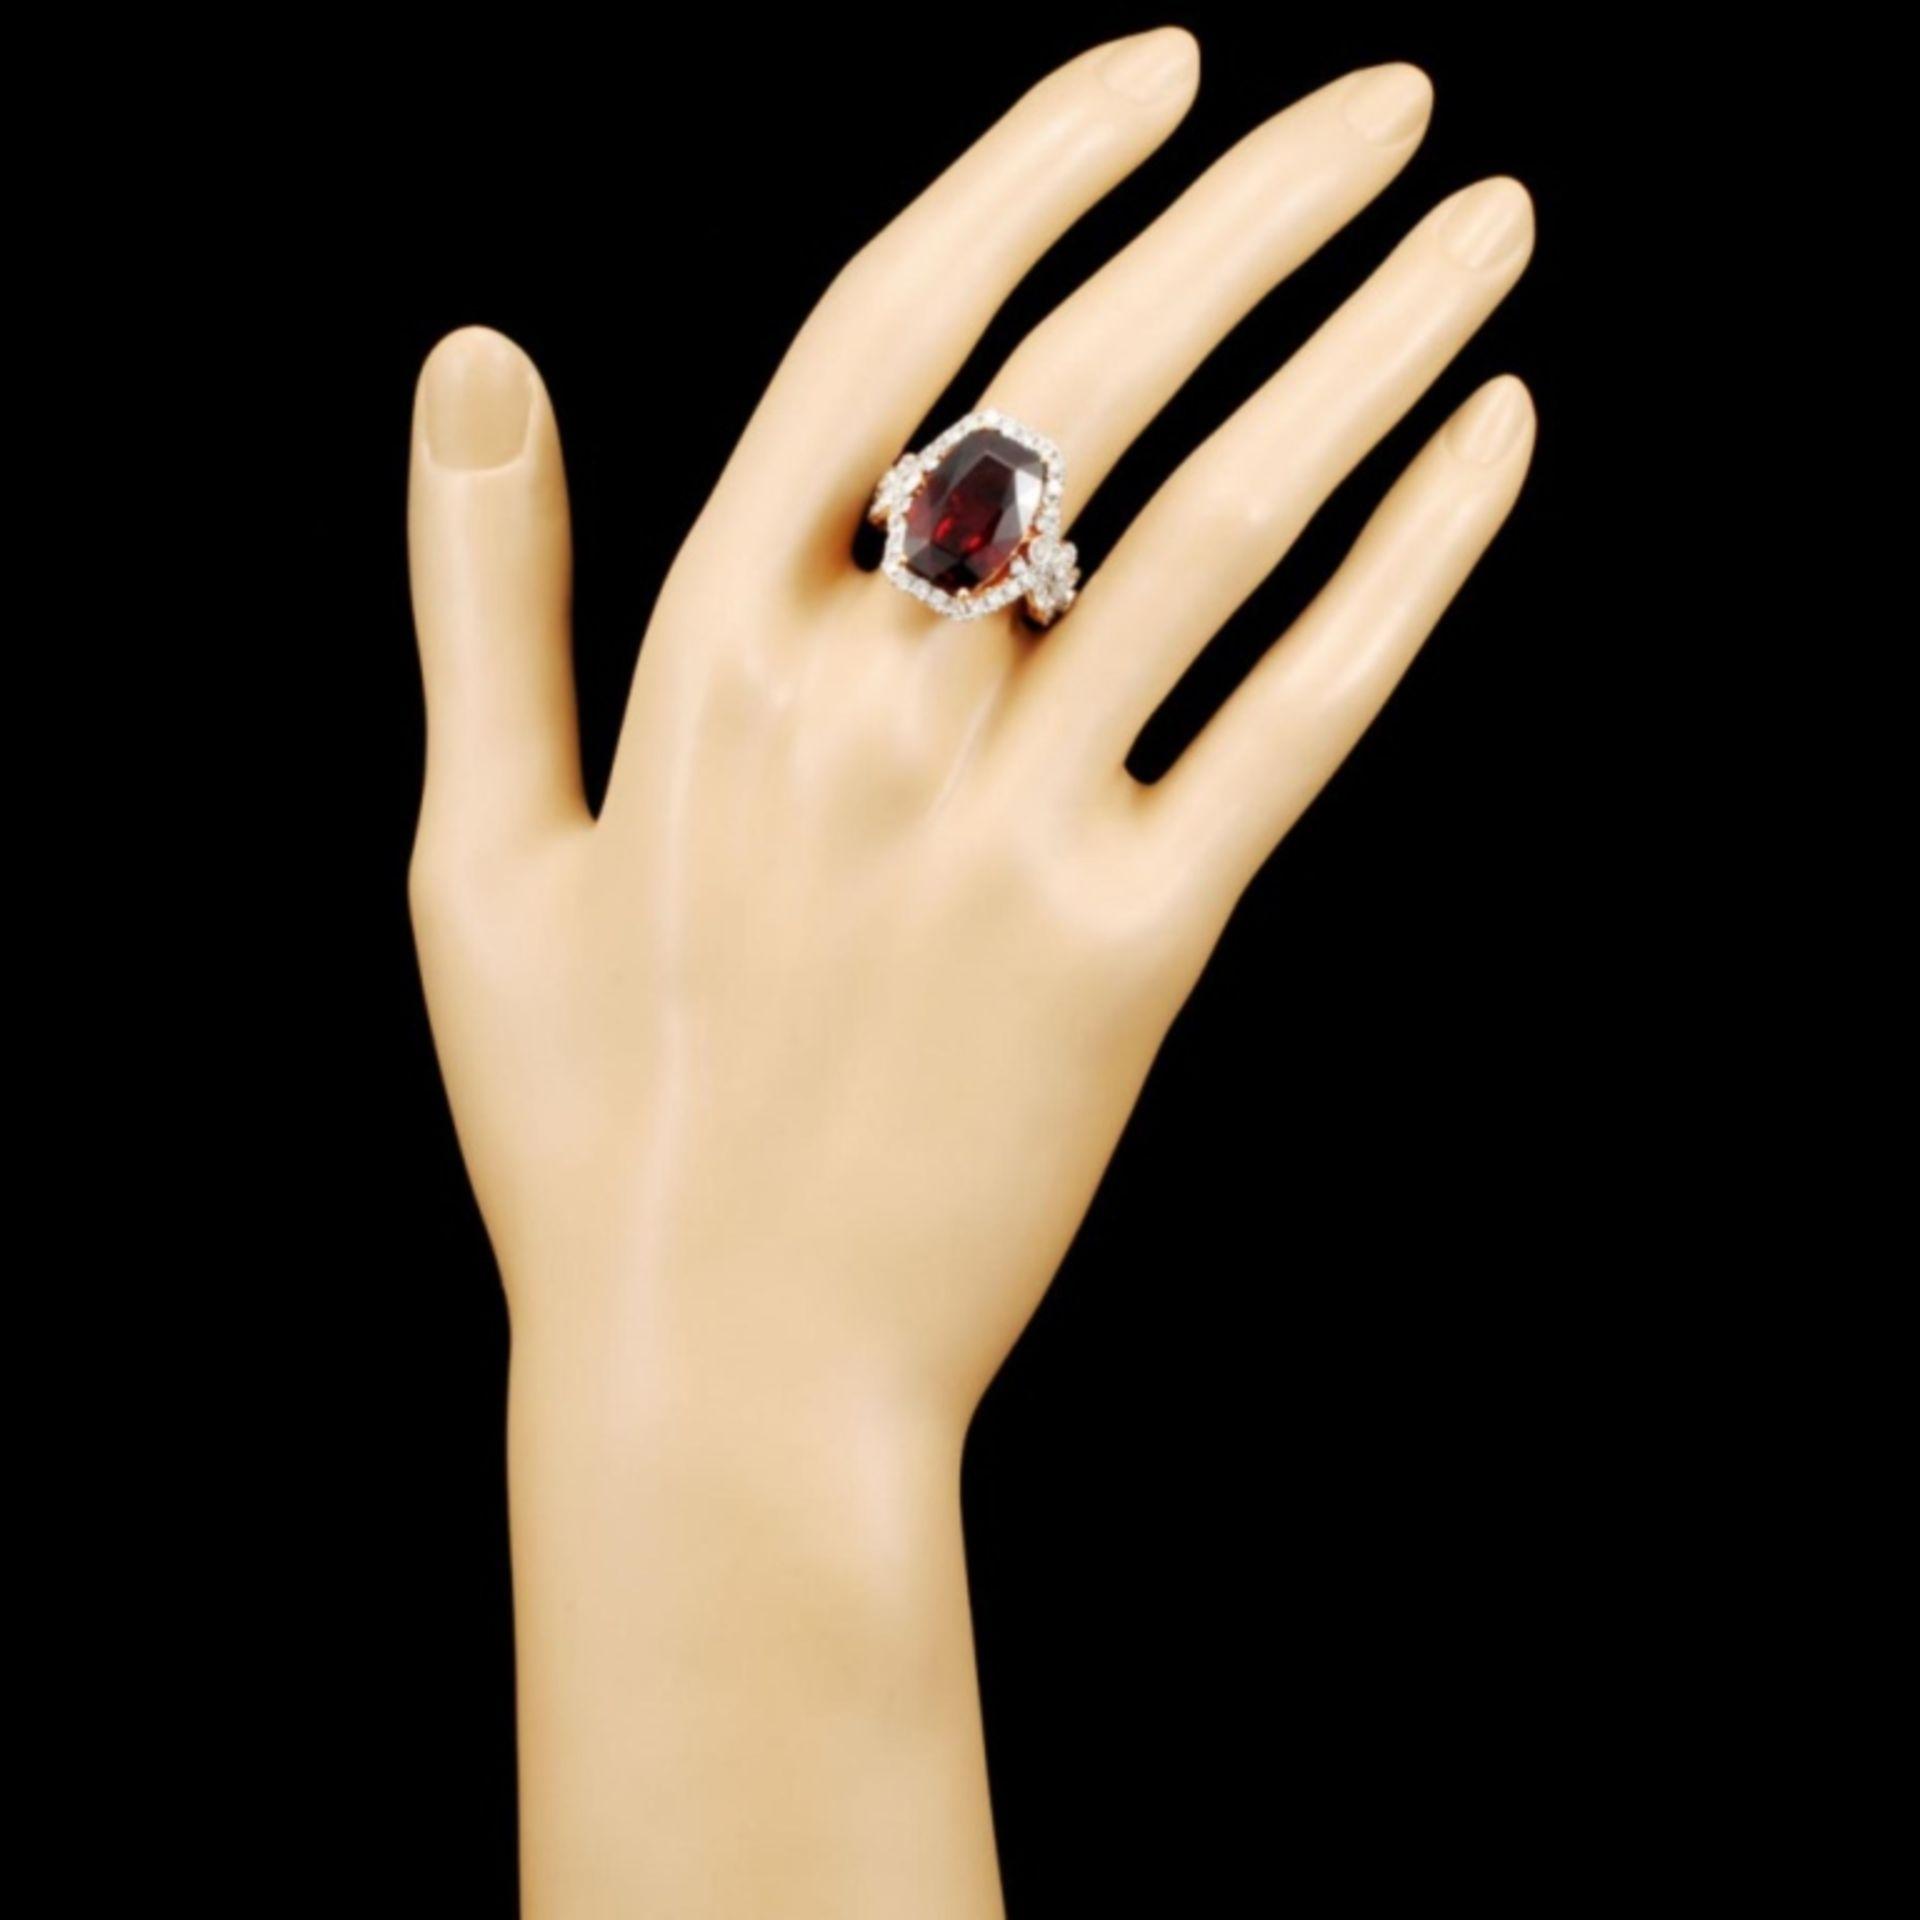 18K Gold 16.46ct Garnet & 1.81ctw Diamond Ring - Image 4 of 5